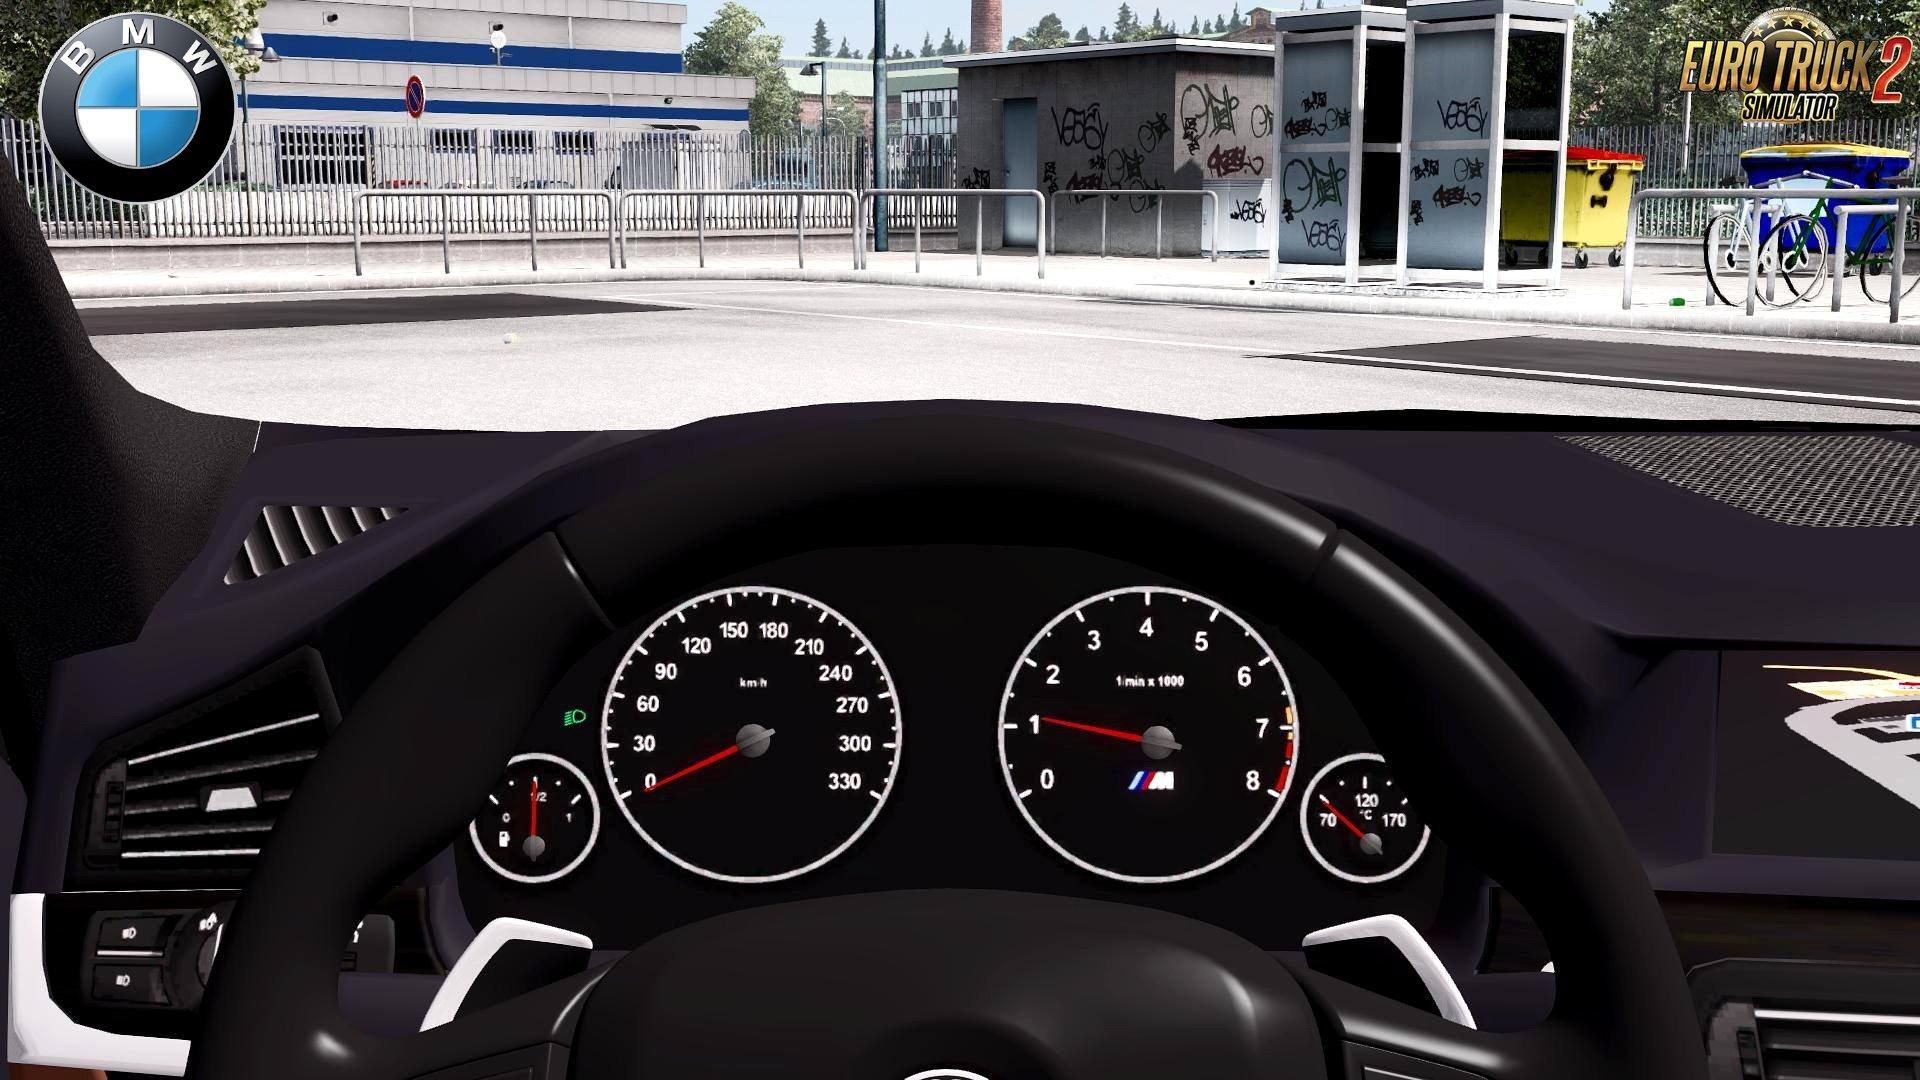 BMW M5 F10 Interior V30 Upgraded 128x Download